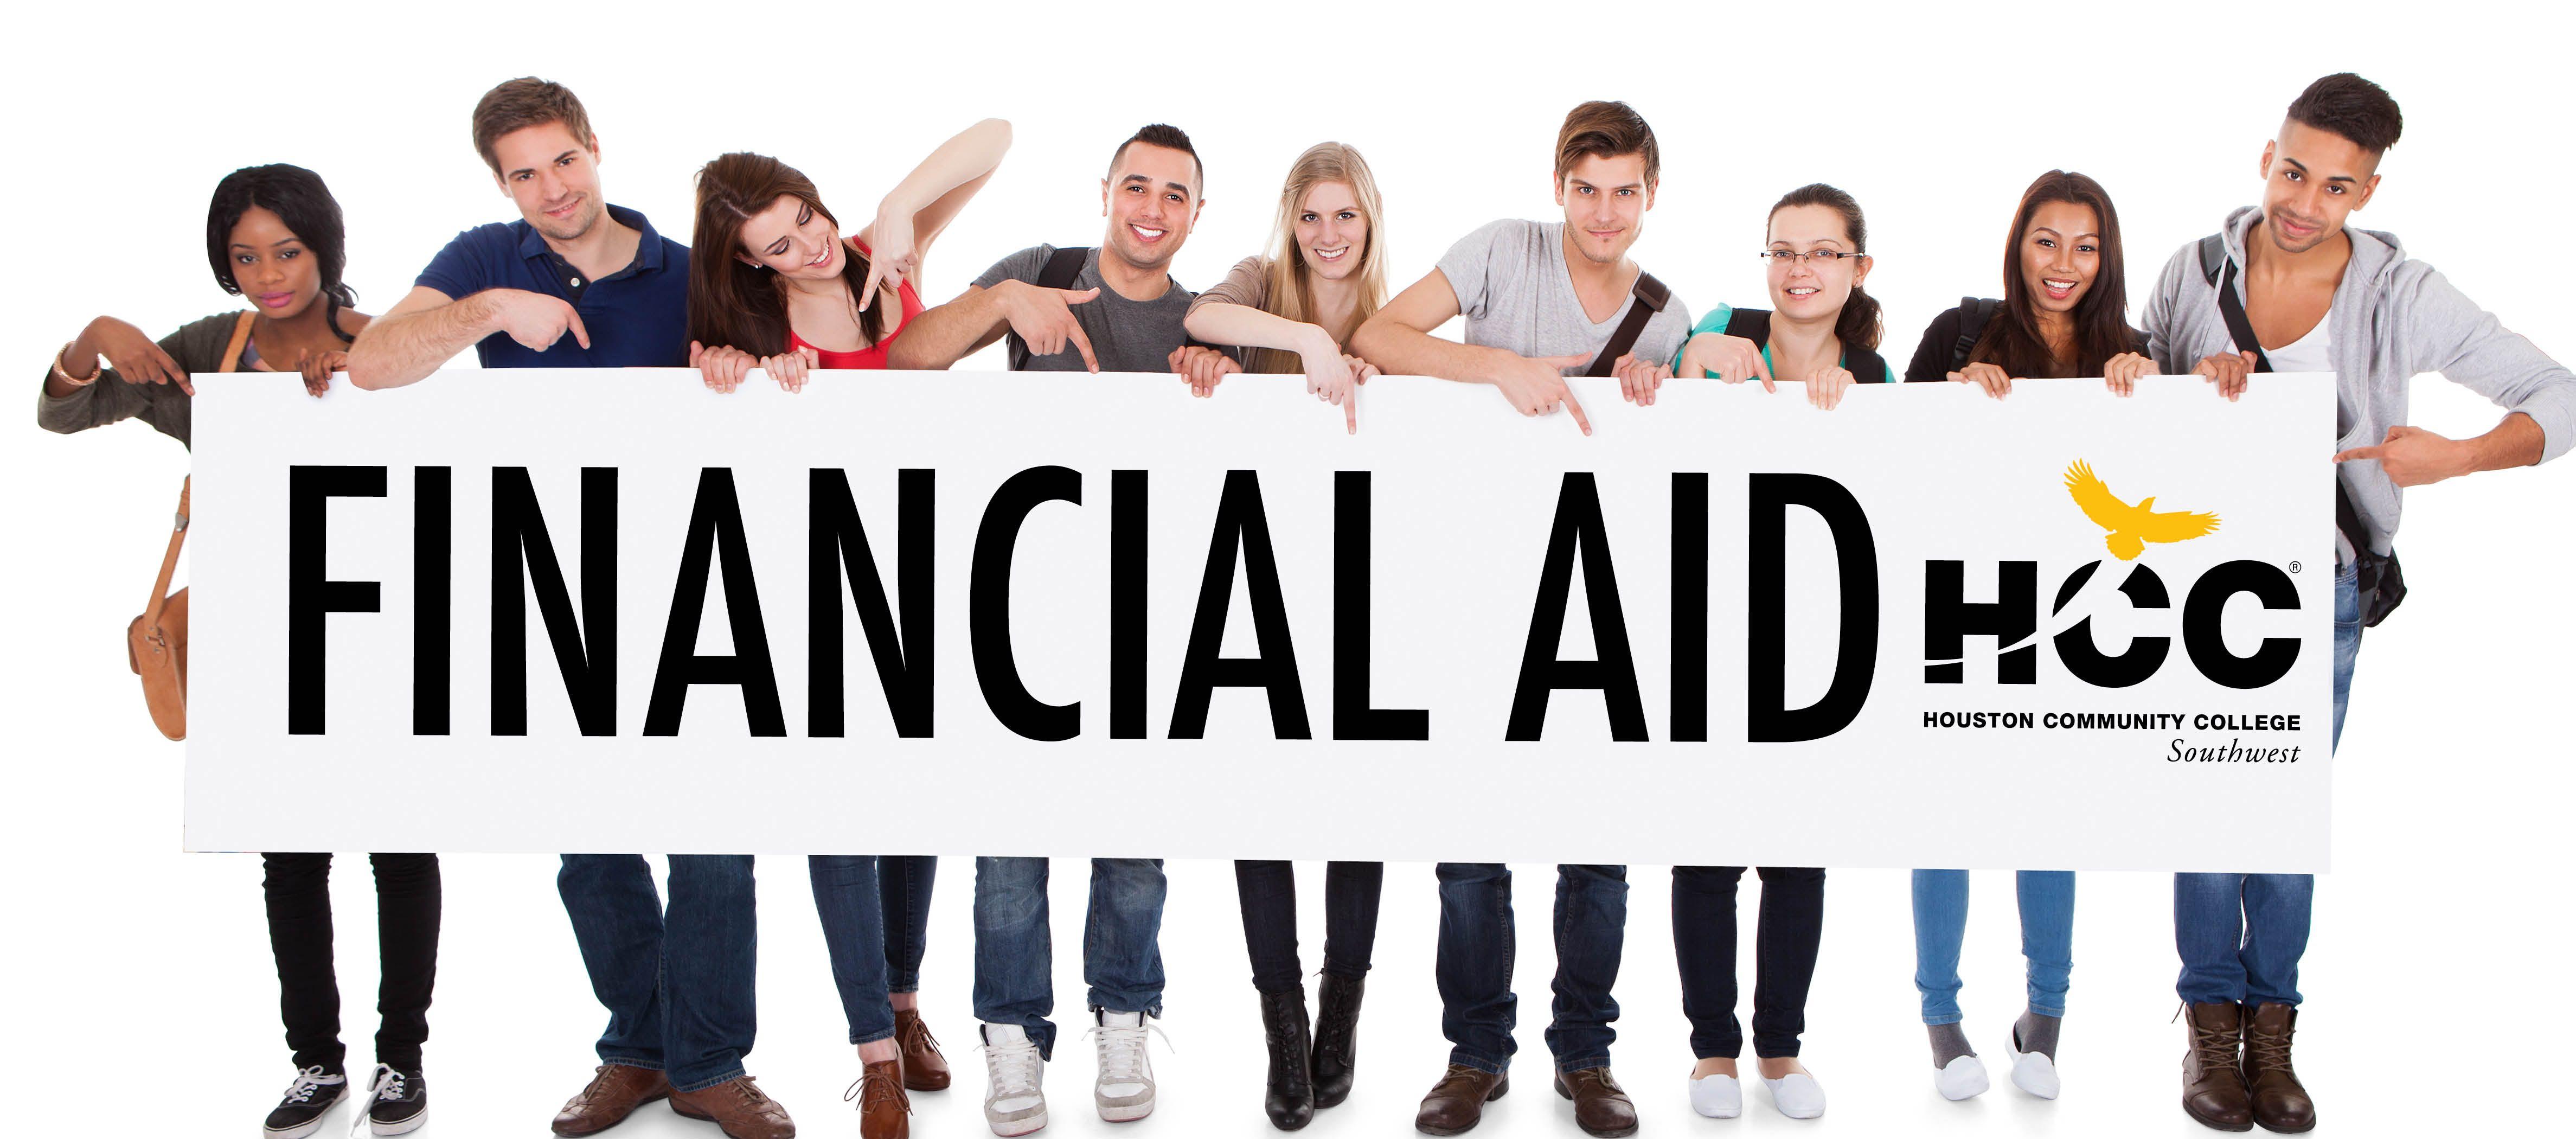 Financial aid financial aid houston community college